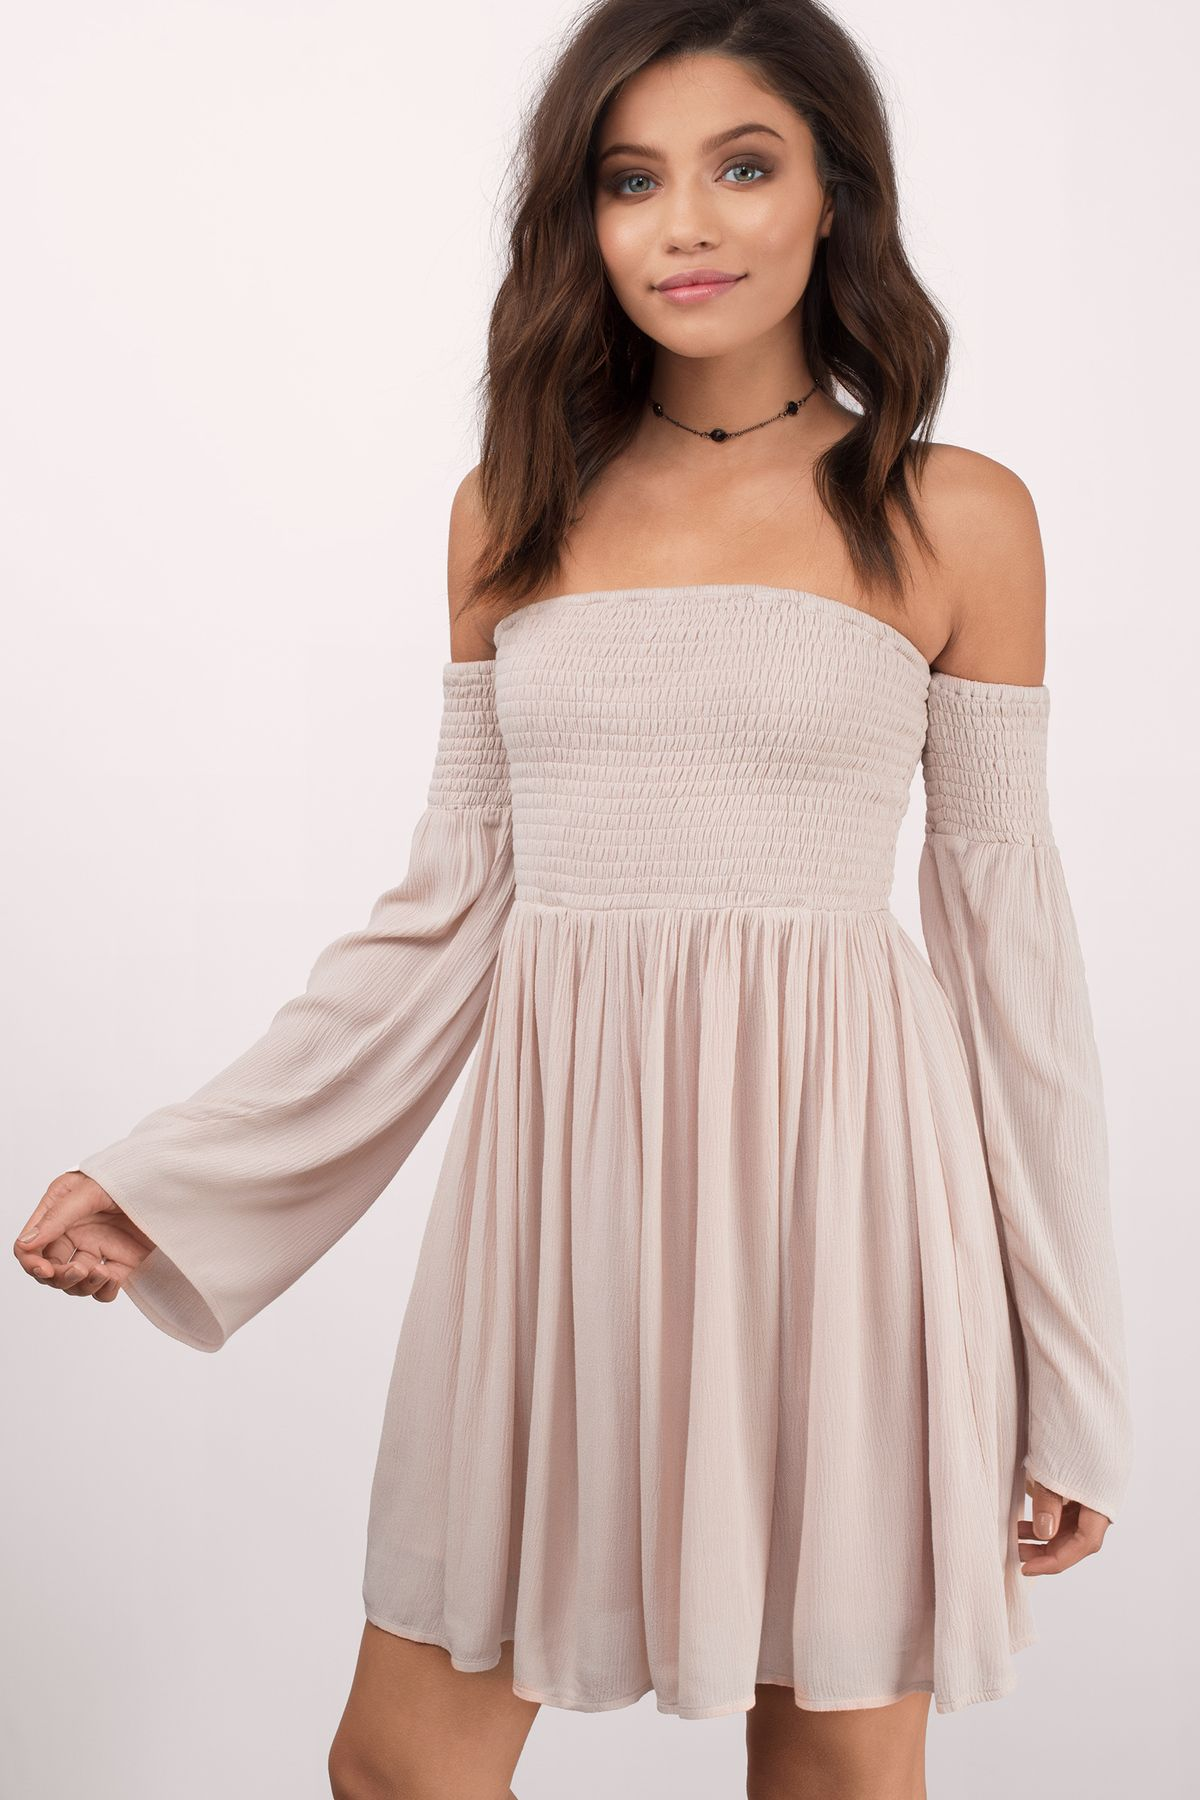 Ellie Off The Shoulder Dress Cute Dresses Black Long Sleeve Dress Bell Sleeve Dress Boho